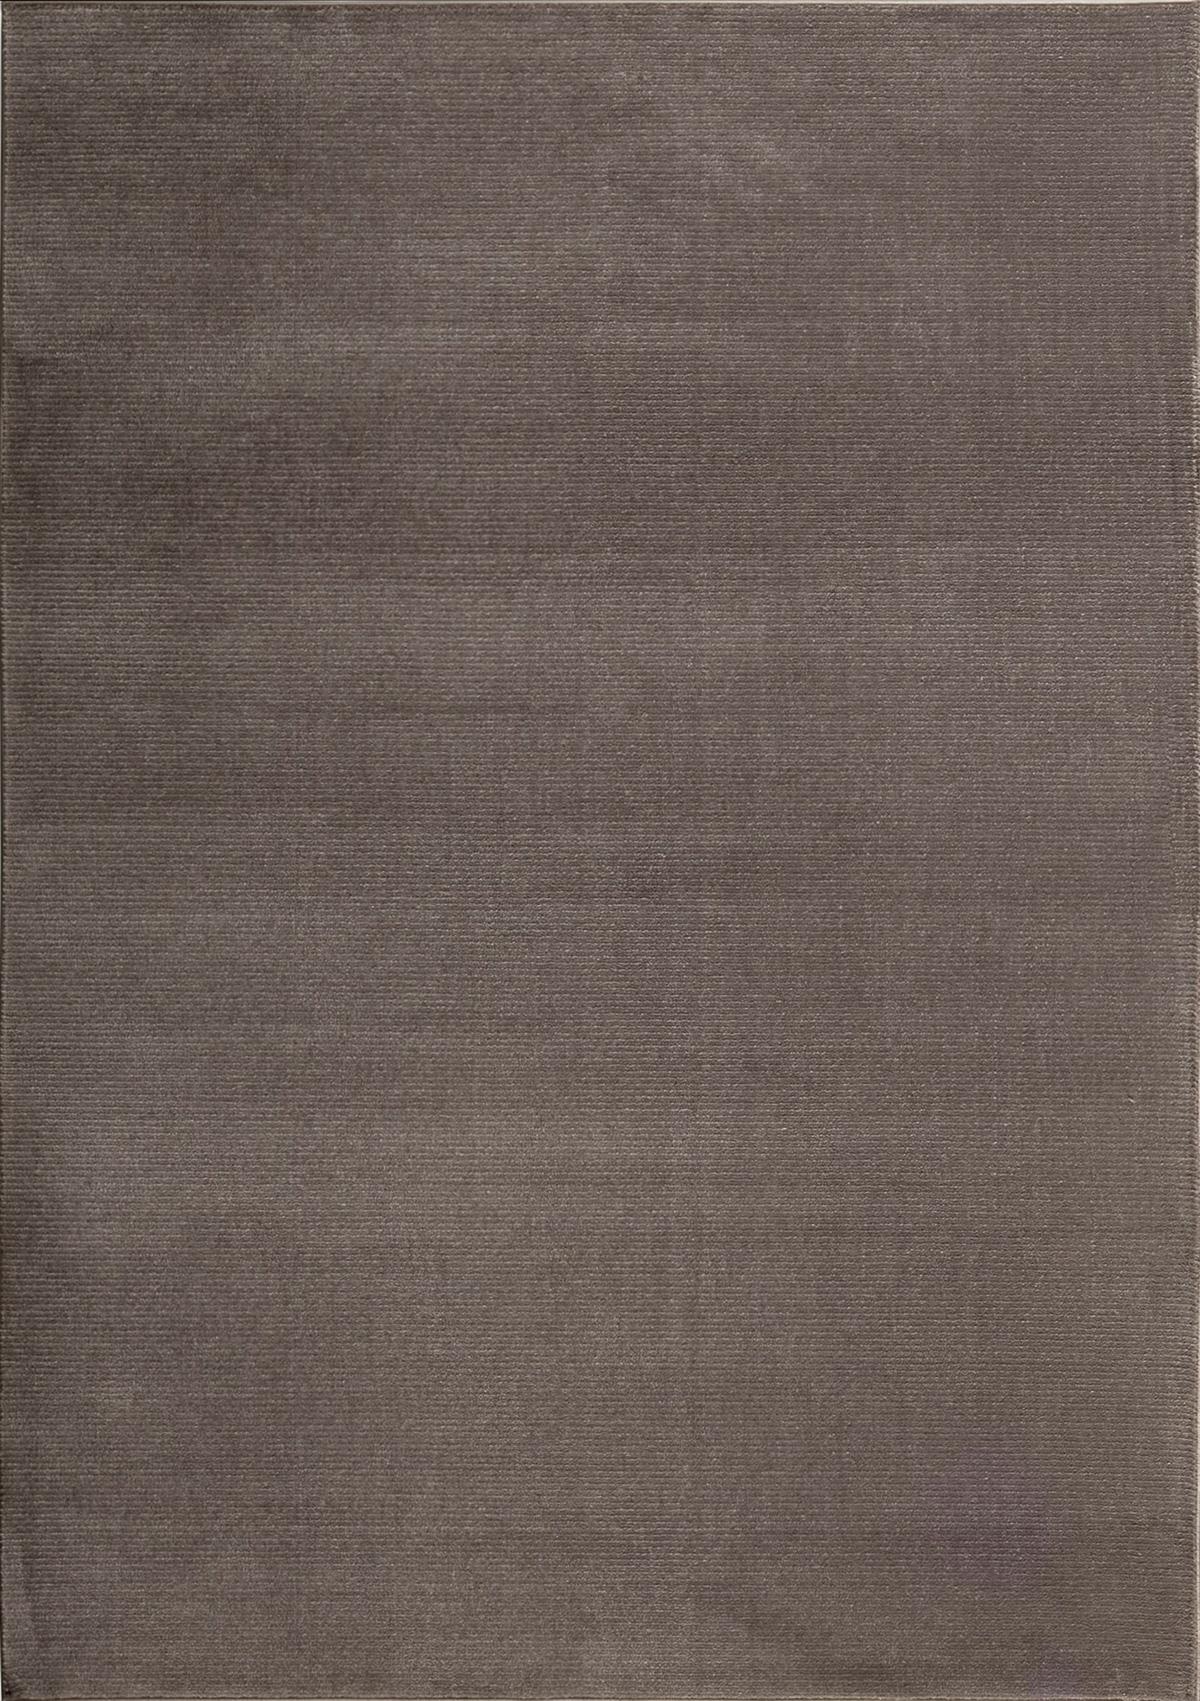 Tapis moderne uni doux taupe 120x170